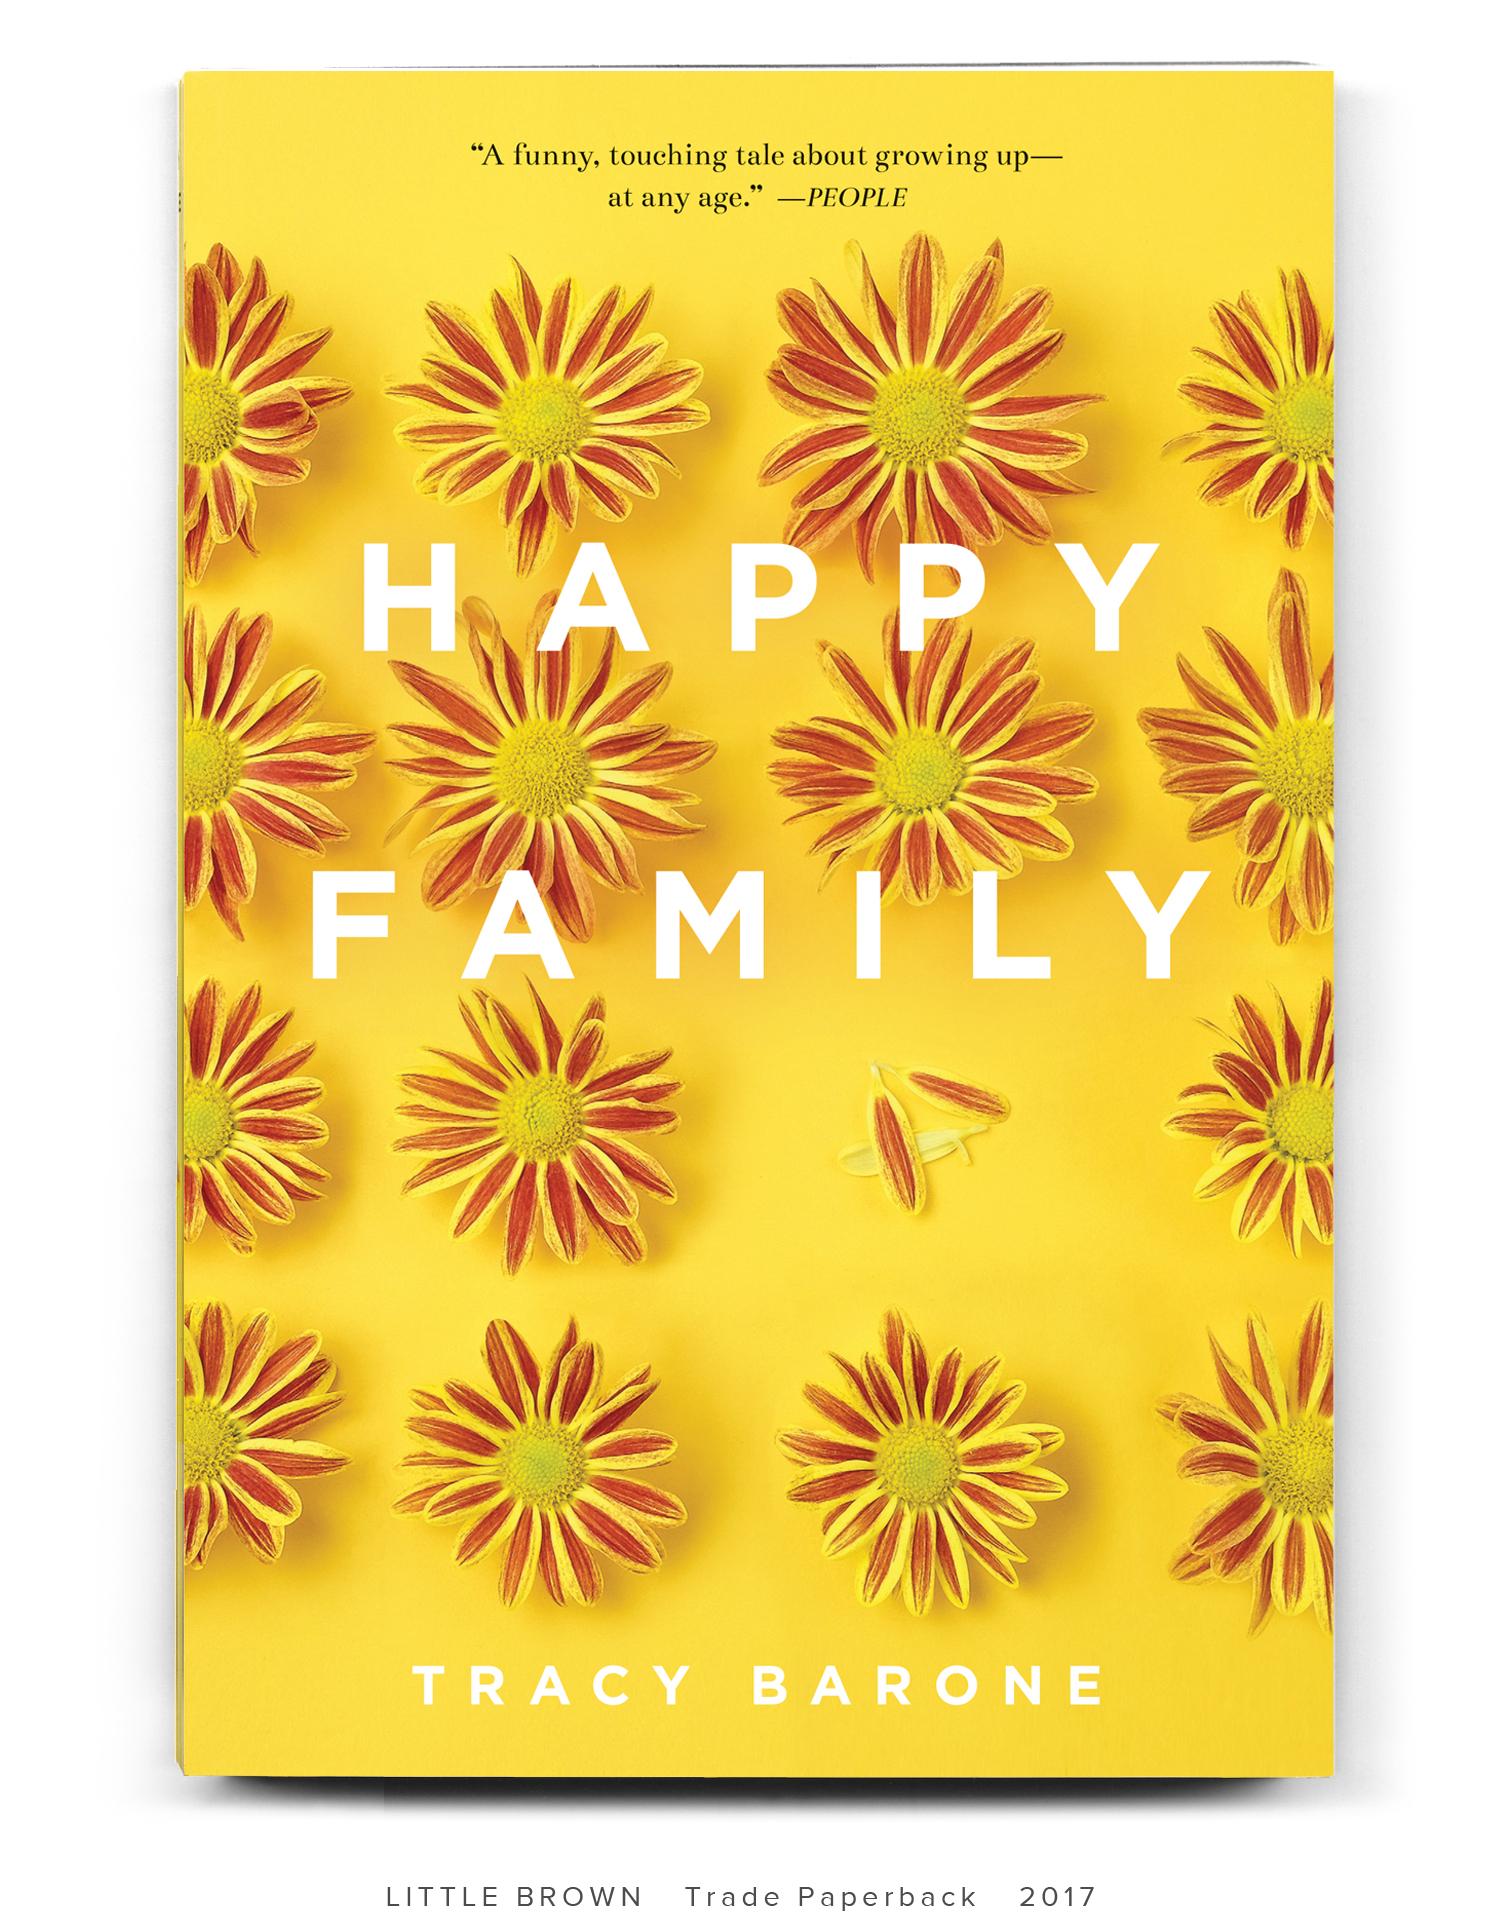 HAPPY-FAMILY-tpb-ss6.jpg